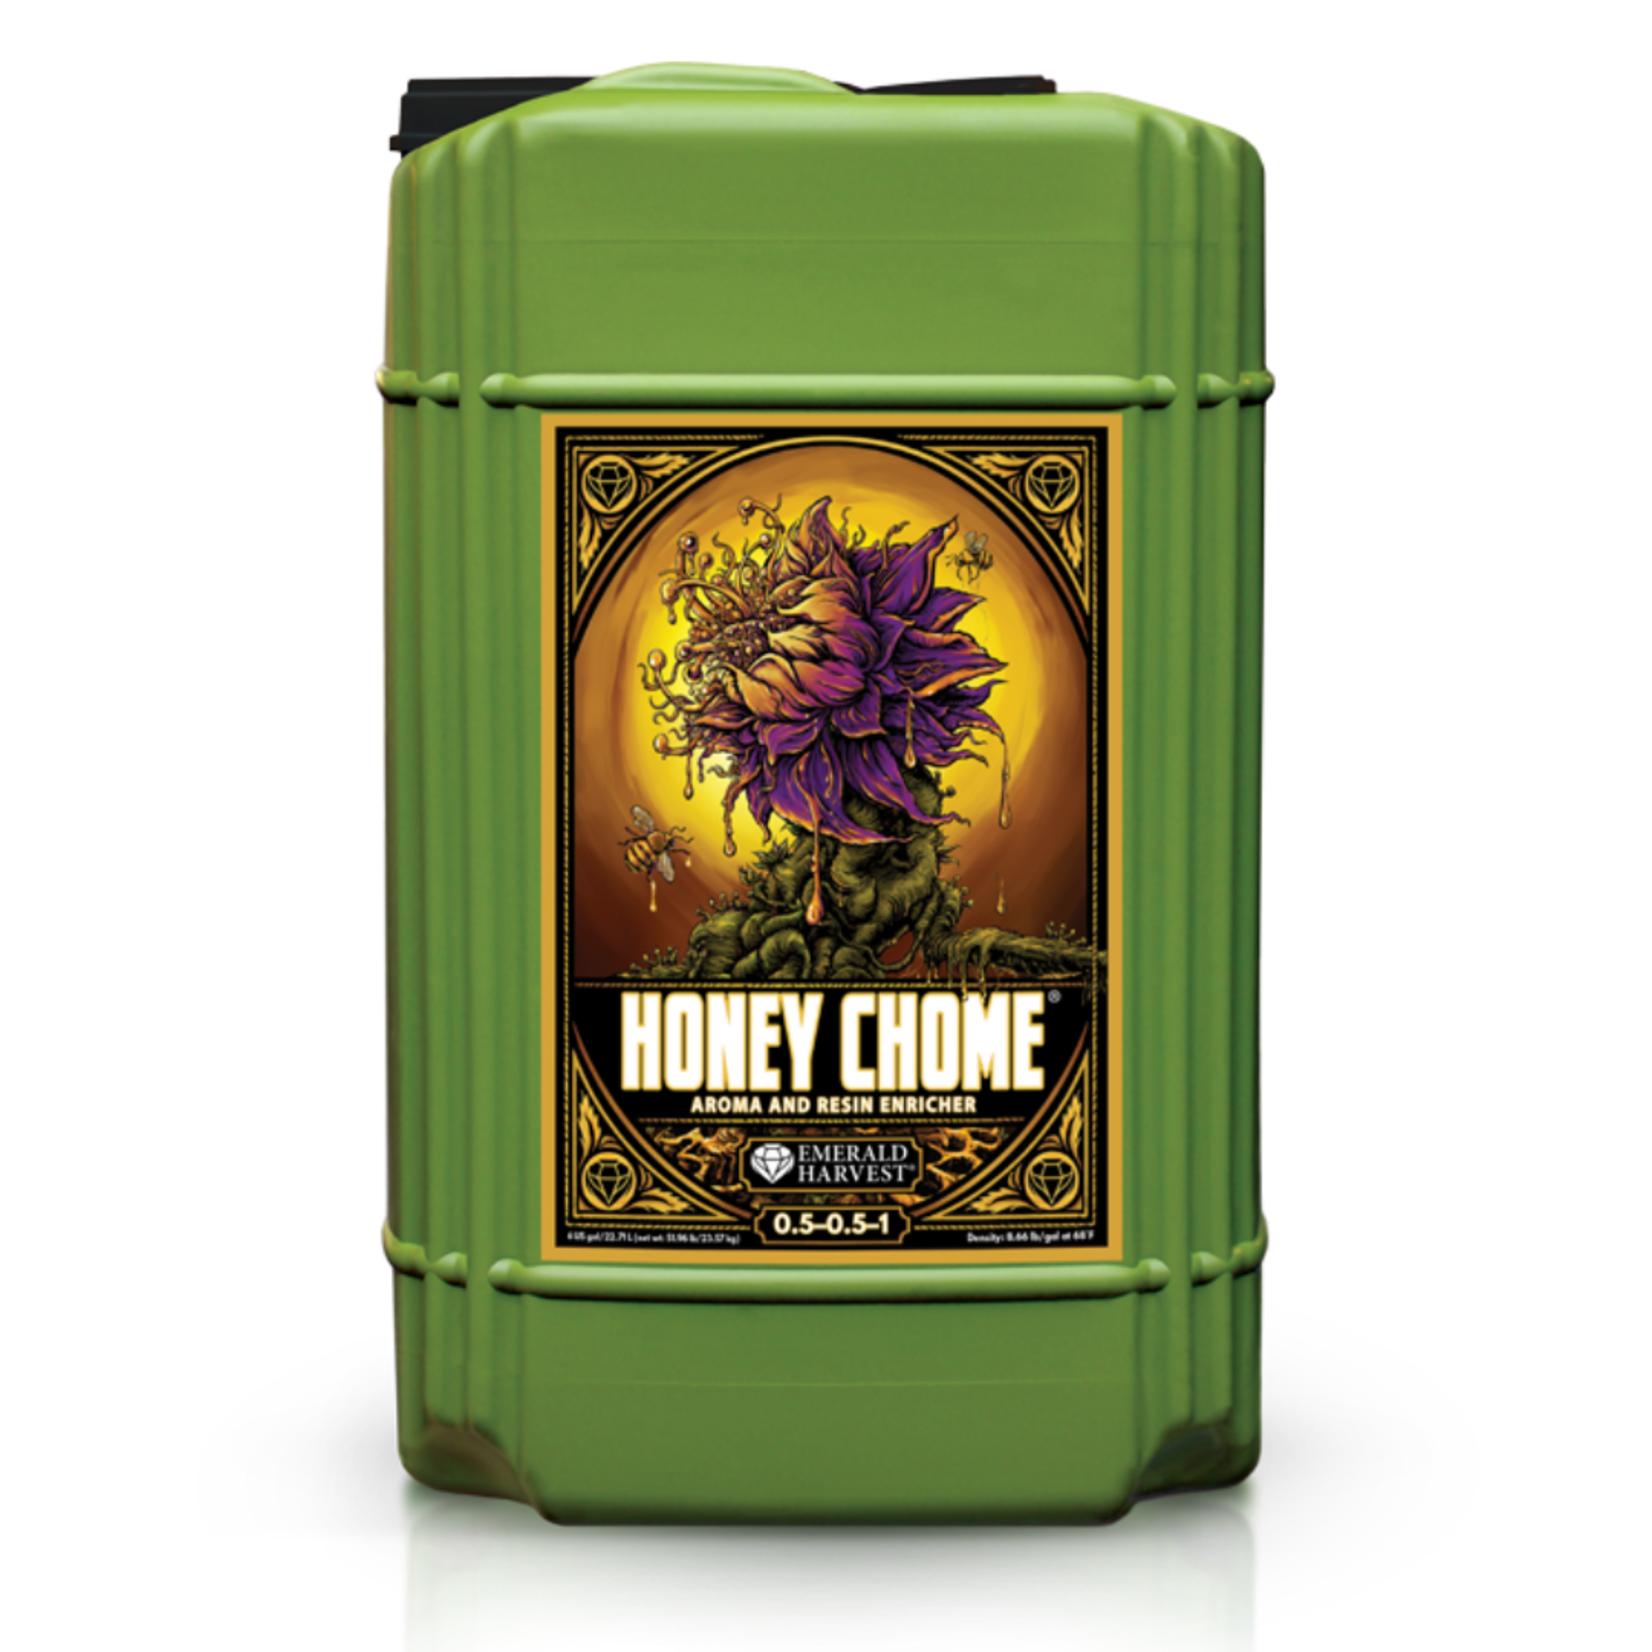 Emerald Harvest Honey Chome 2.5 Gallon/9.46L